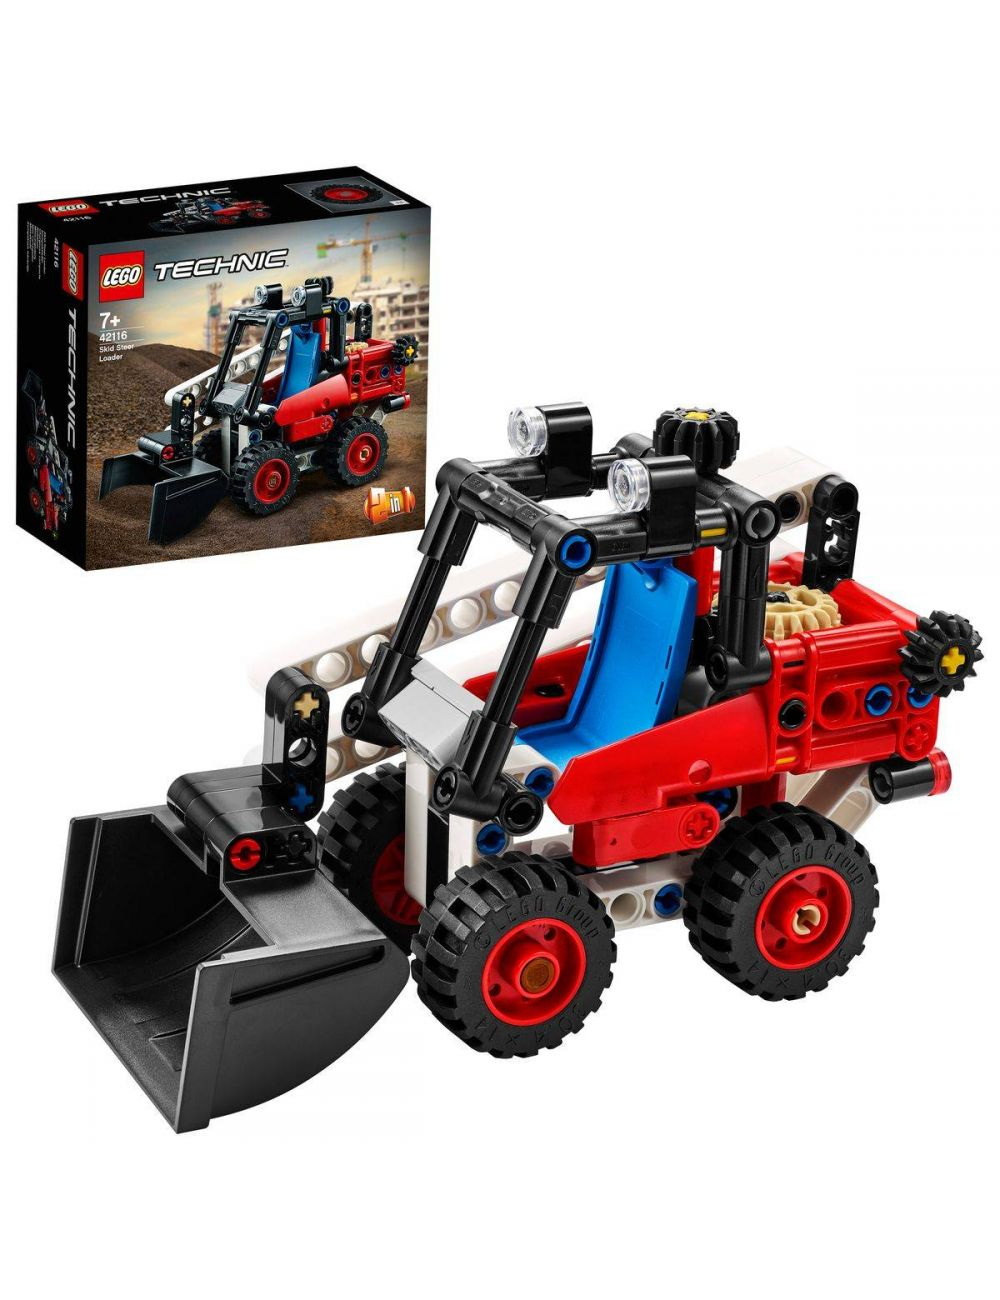 LEGO TECHNIC klocki Miniładowarka 42116